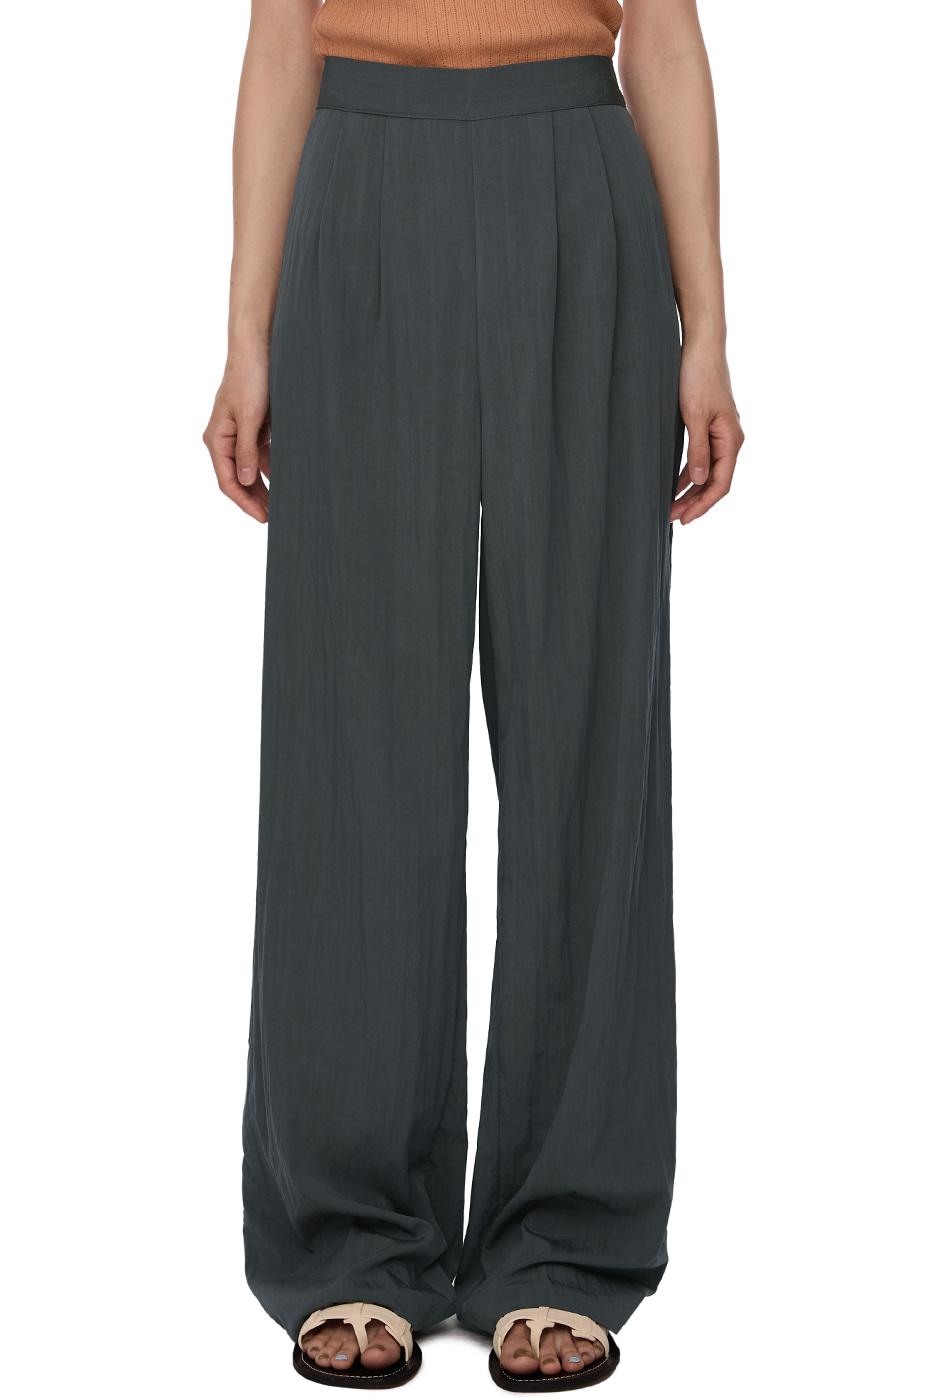 Hilton Nylon Straight Pants